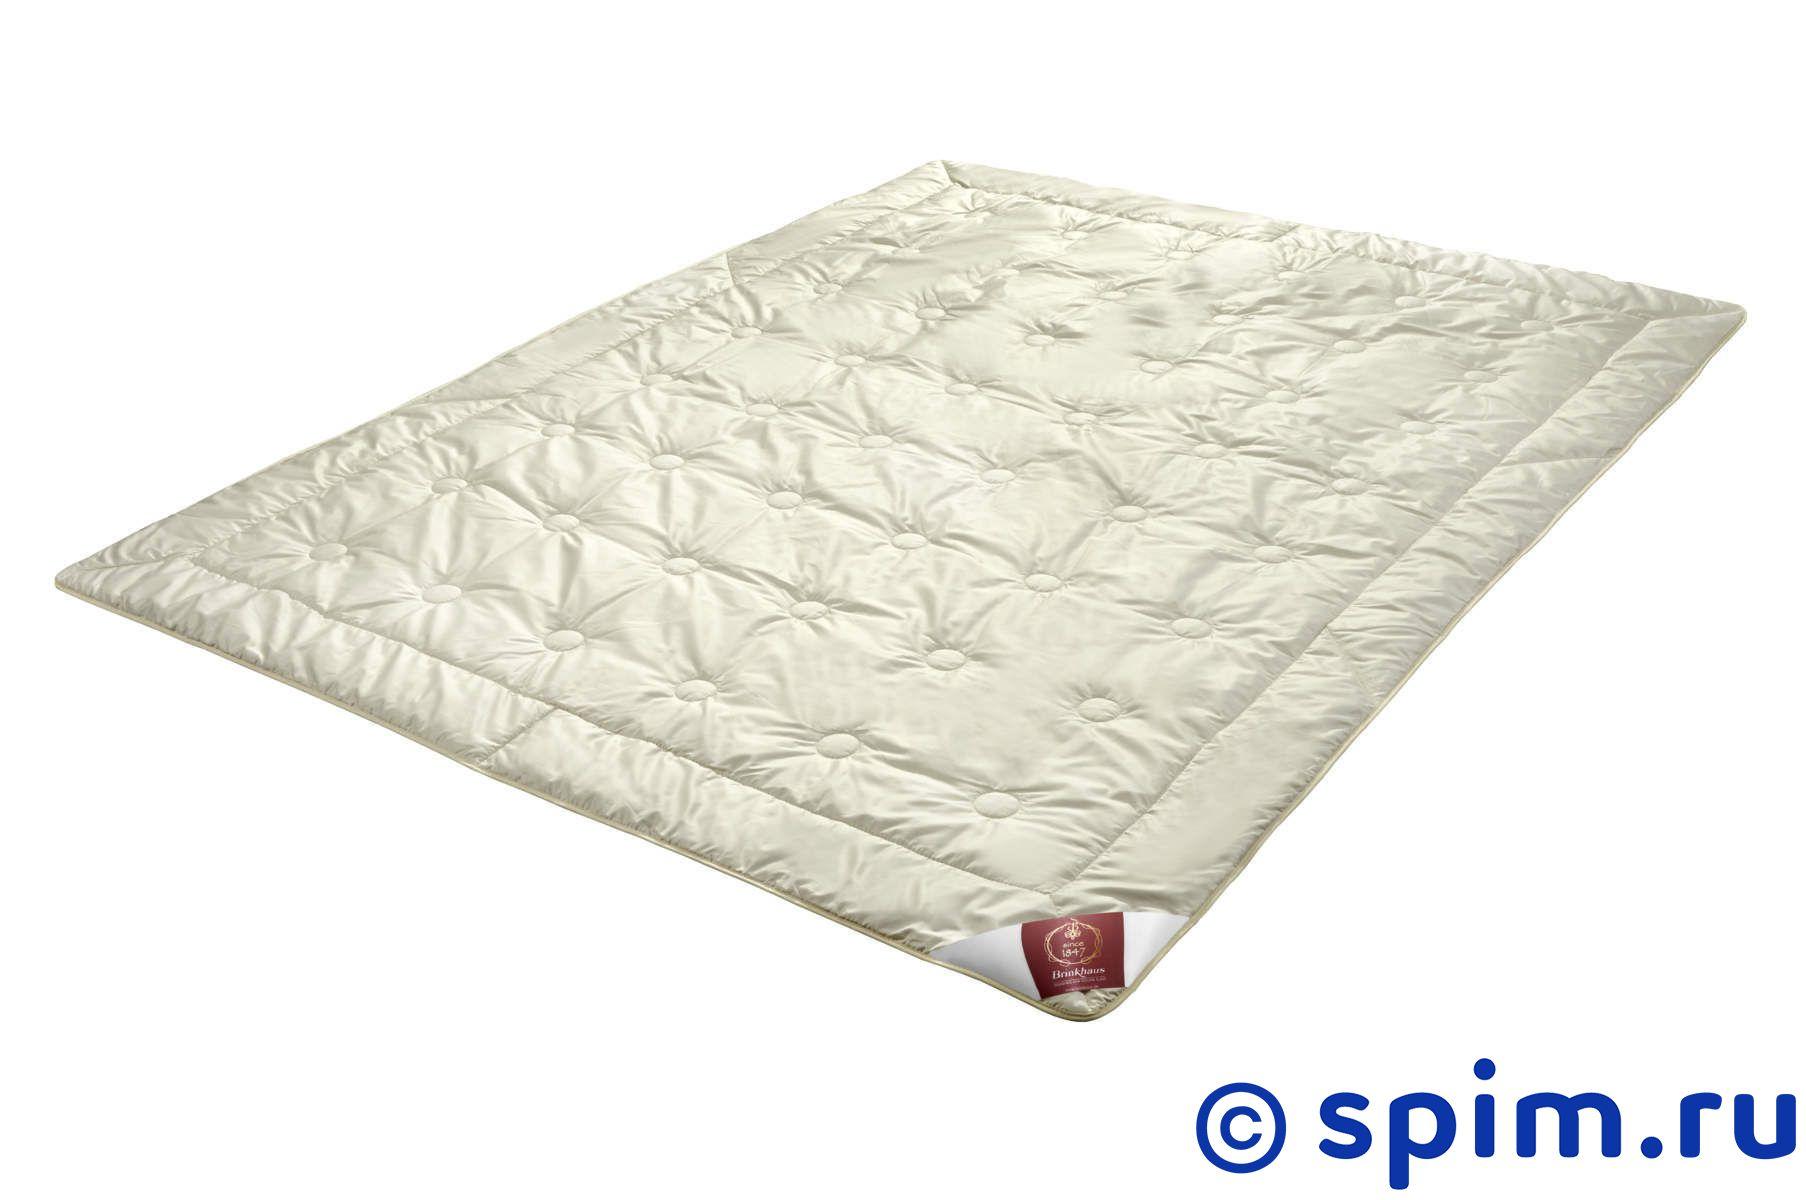 Одеяло Brinkhaus Mahdi, легкое 155х200 см